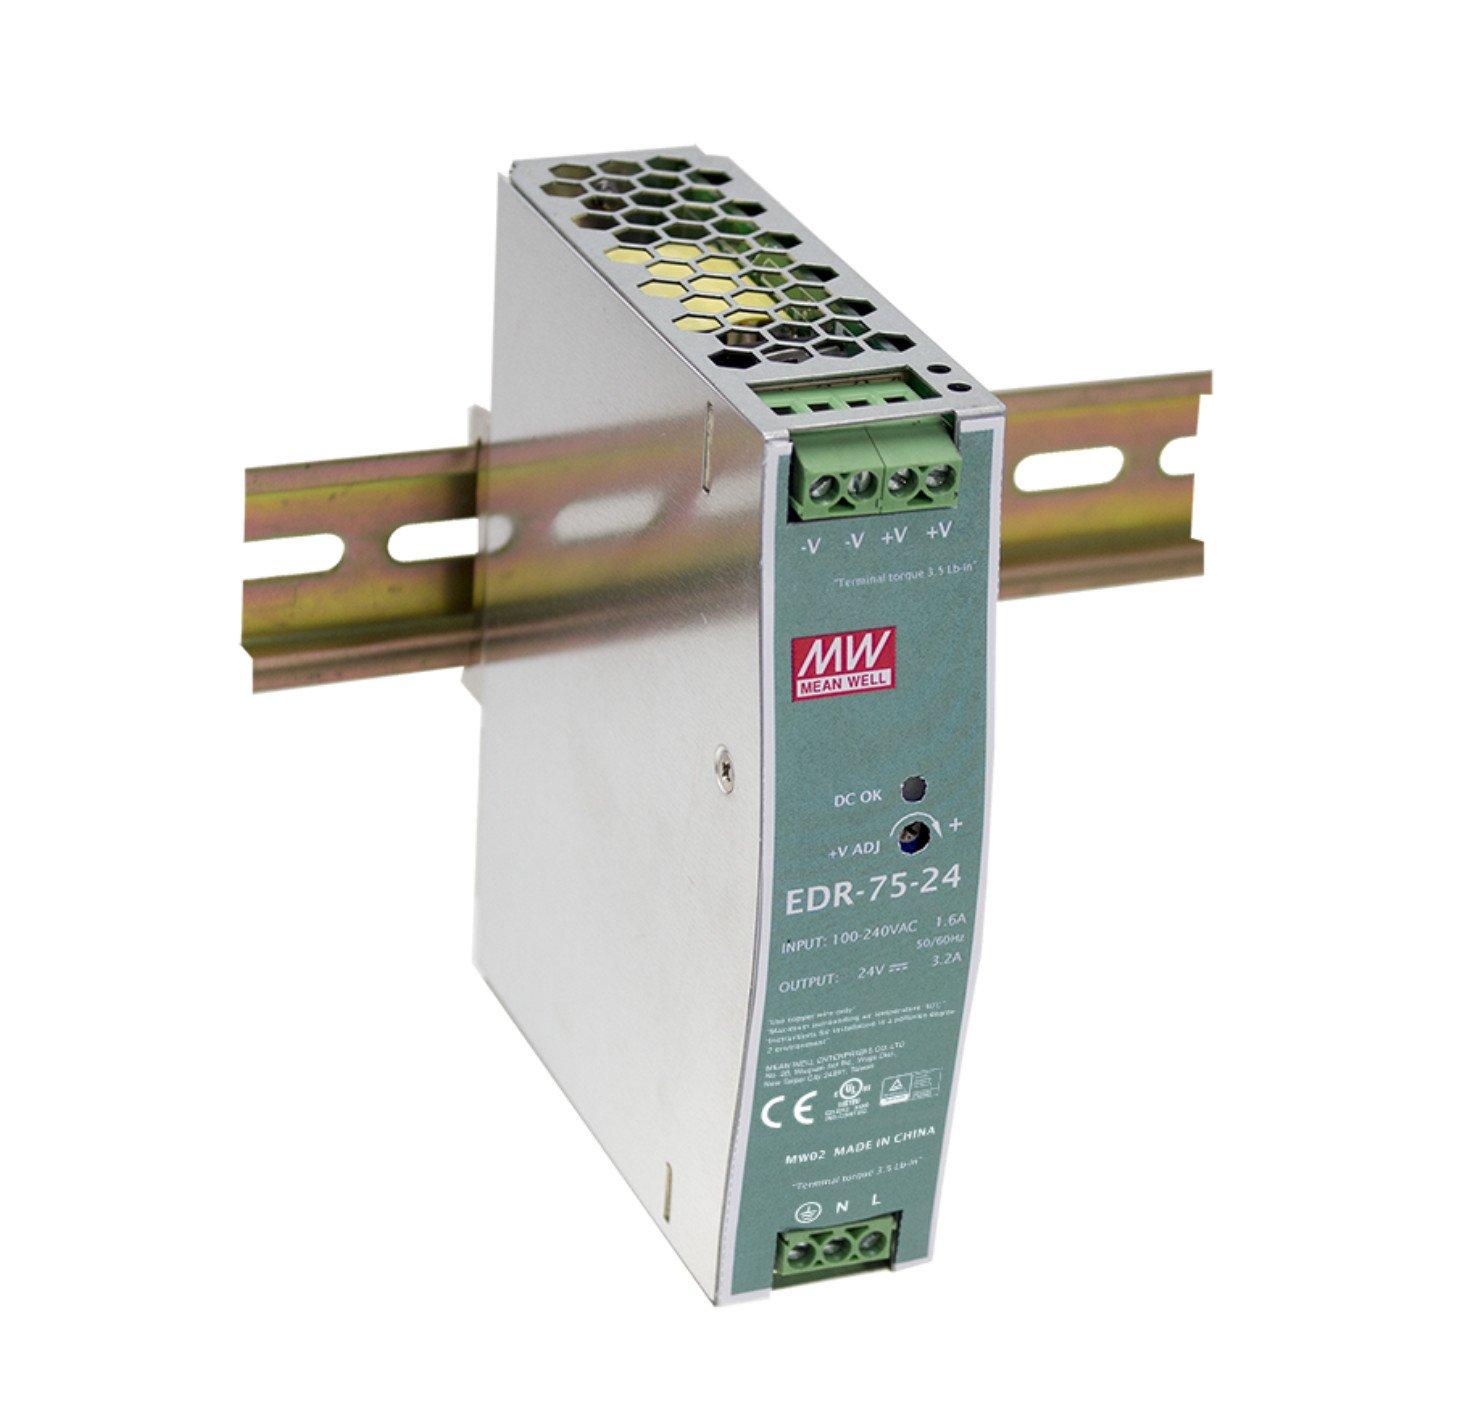 MEAN WELL original EDR-75-48 48V 1.6A meanwell EDR-75 48V 76.8W Single Output Industrial DIN RAIL